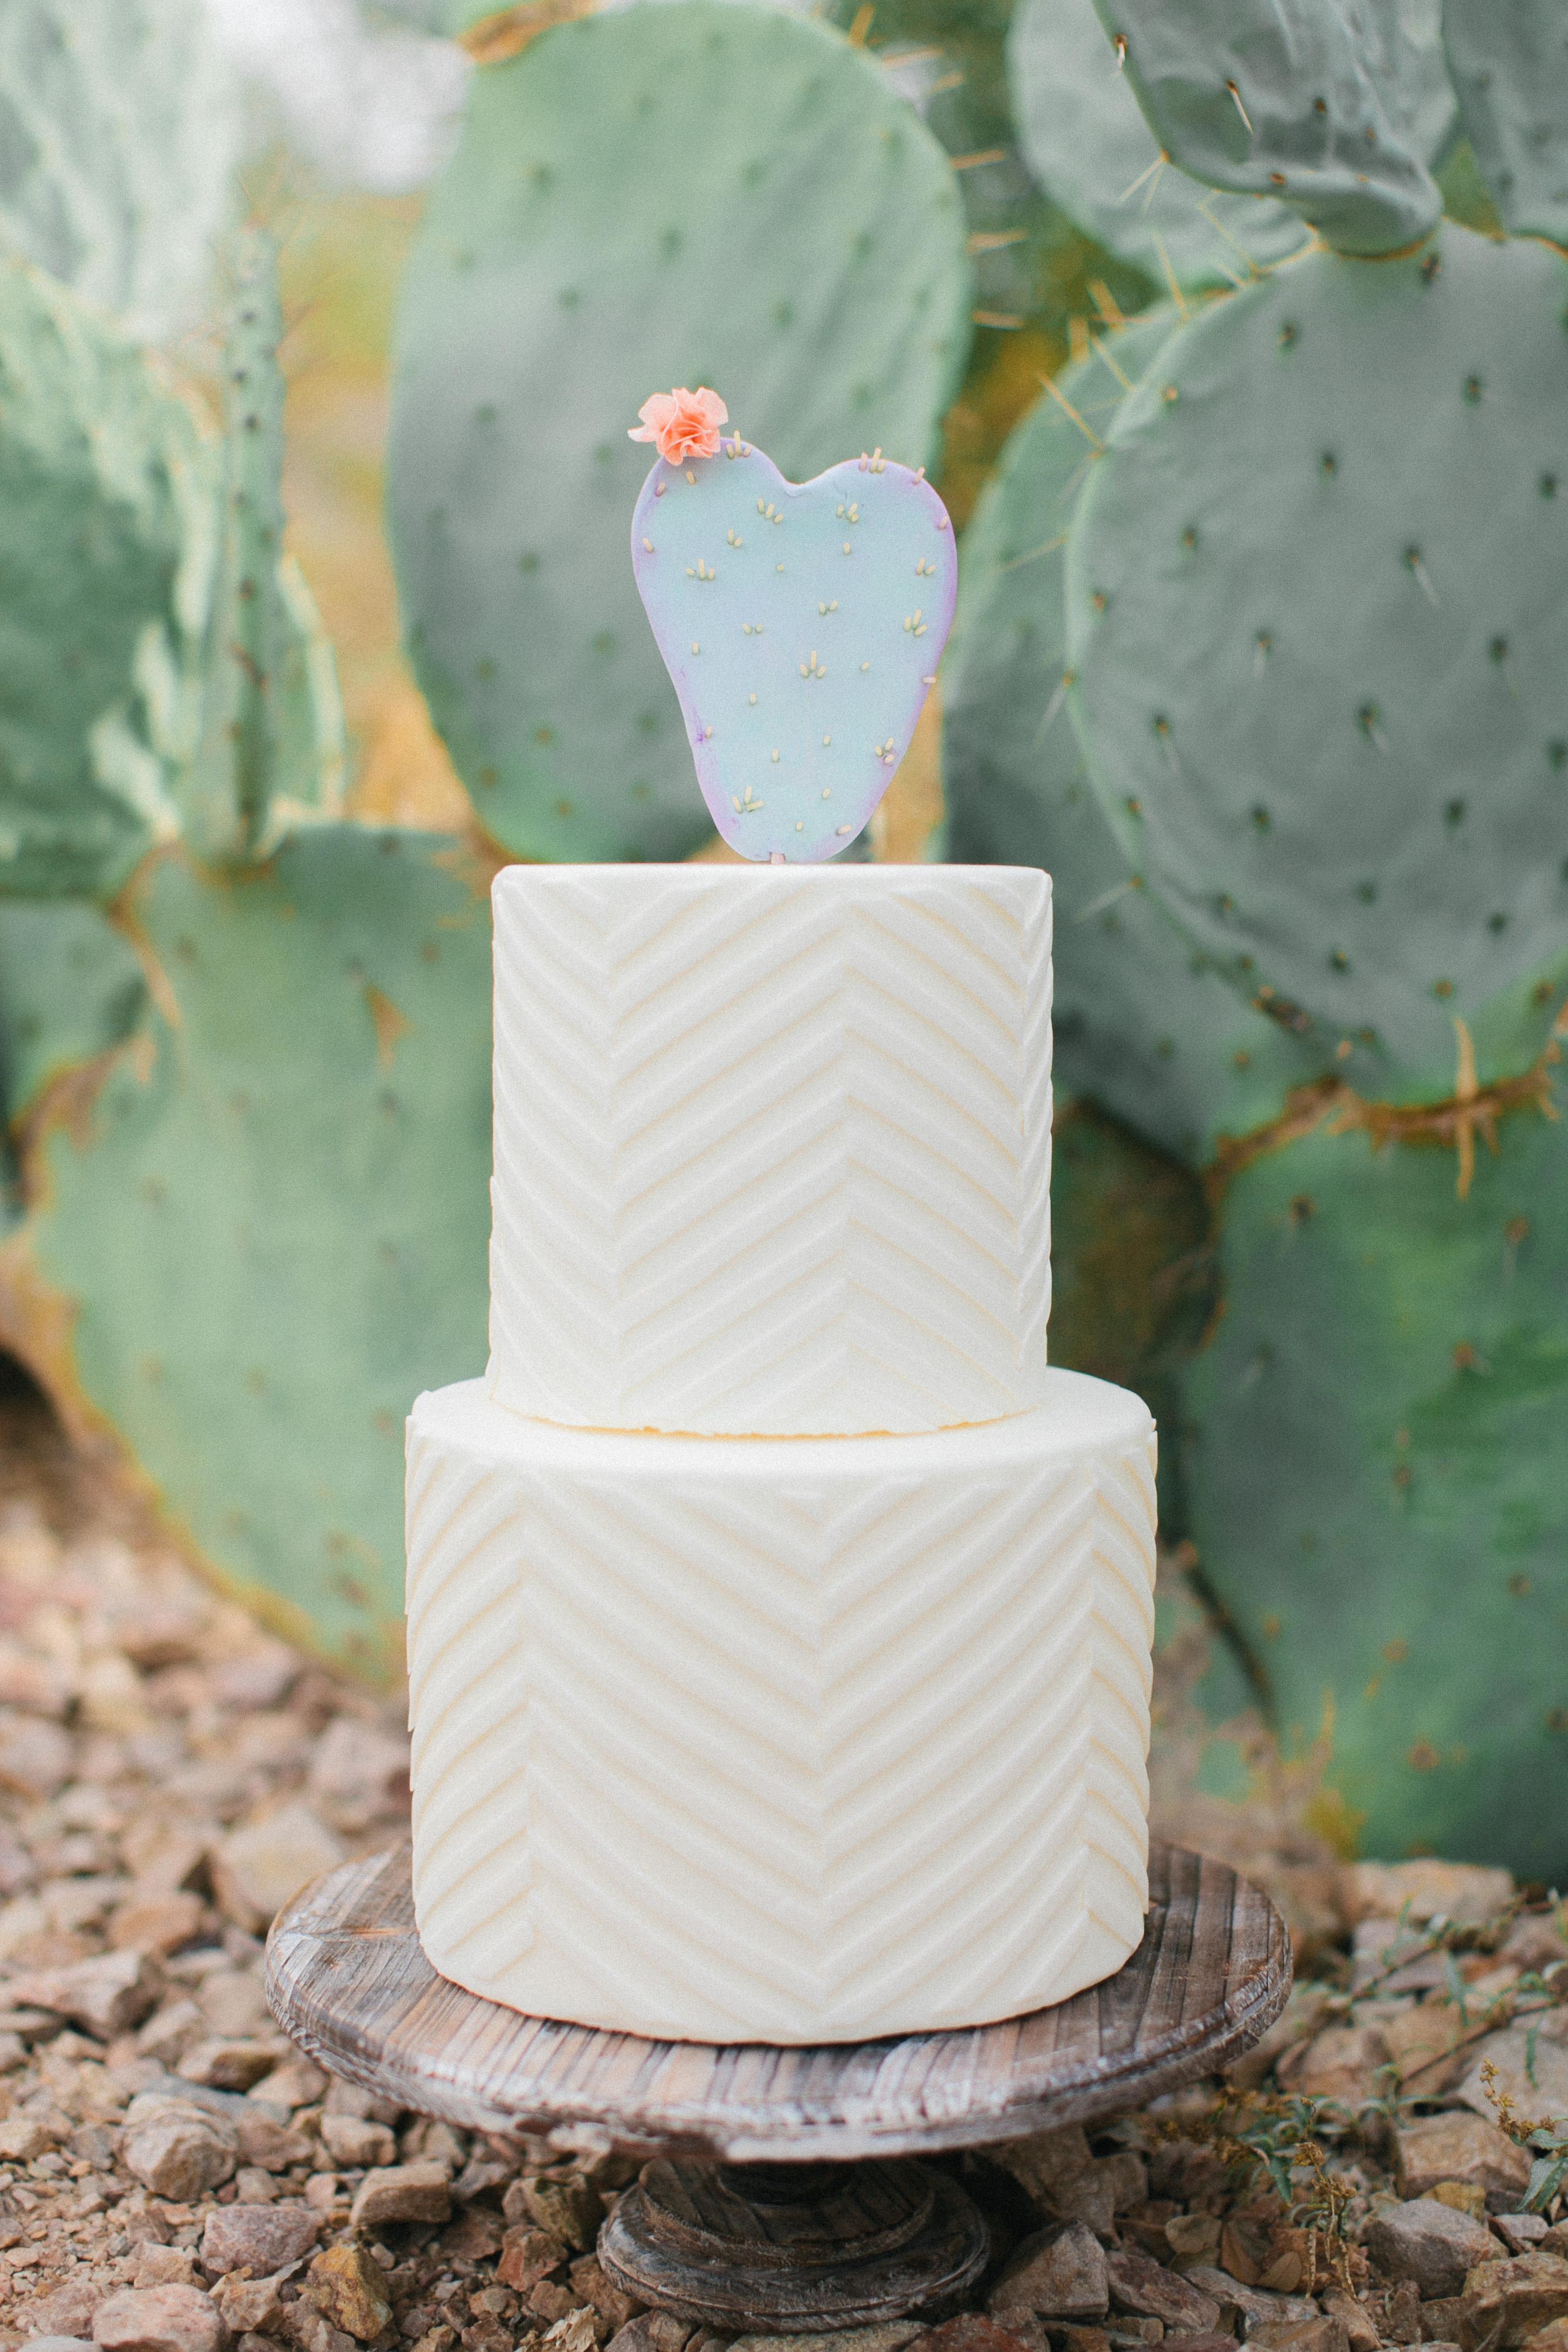 Cactus Wedding Cake Topper on White Cake